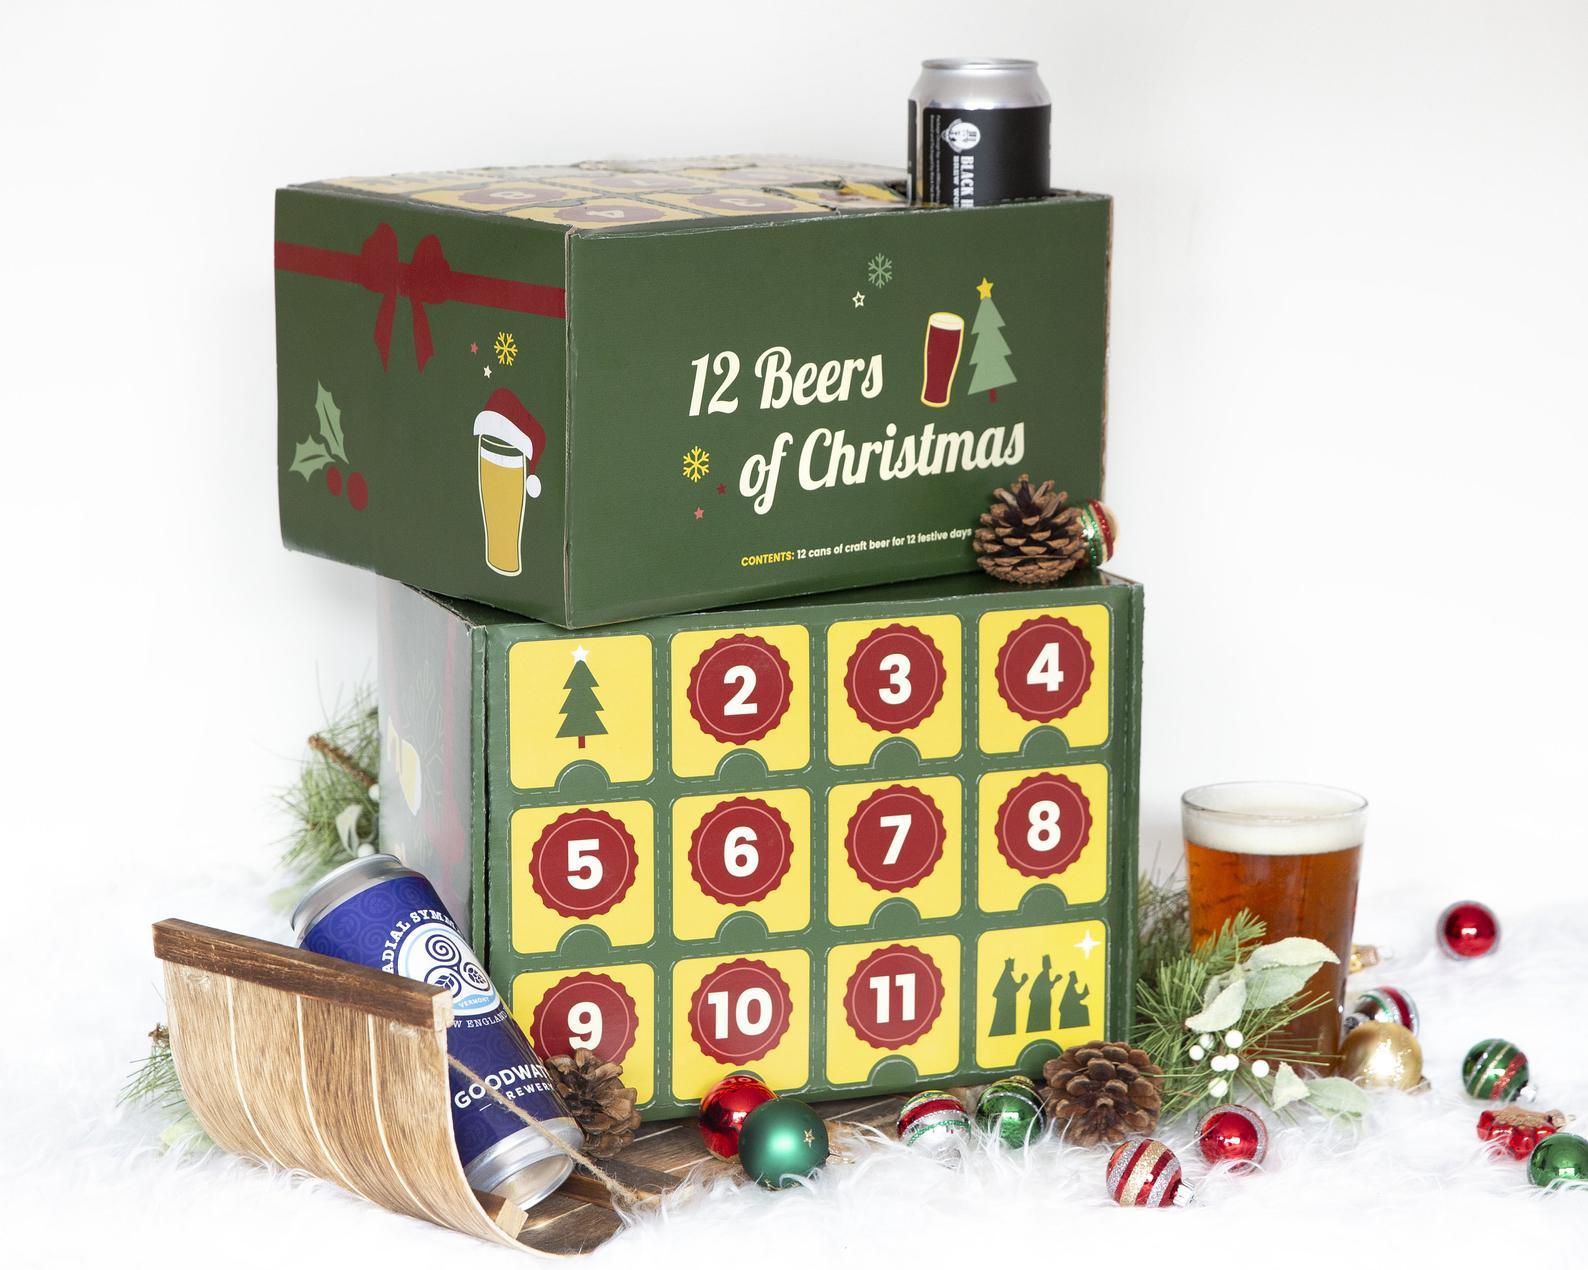 DIY 12 Beers of Christmas Holiday Advent Calendar